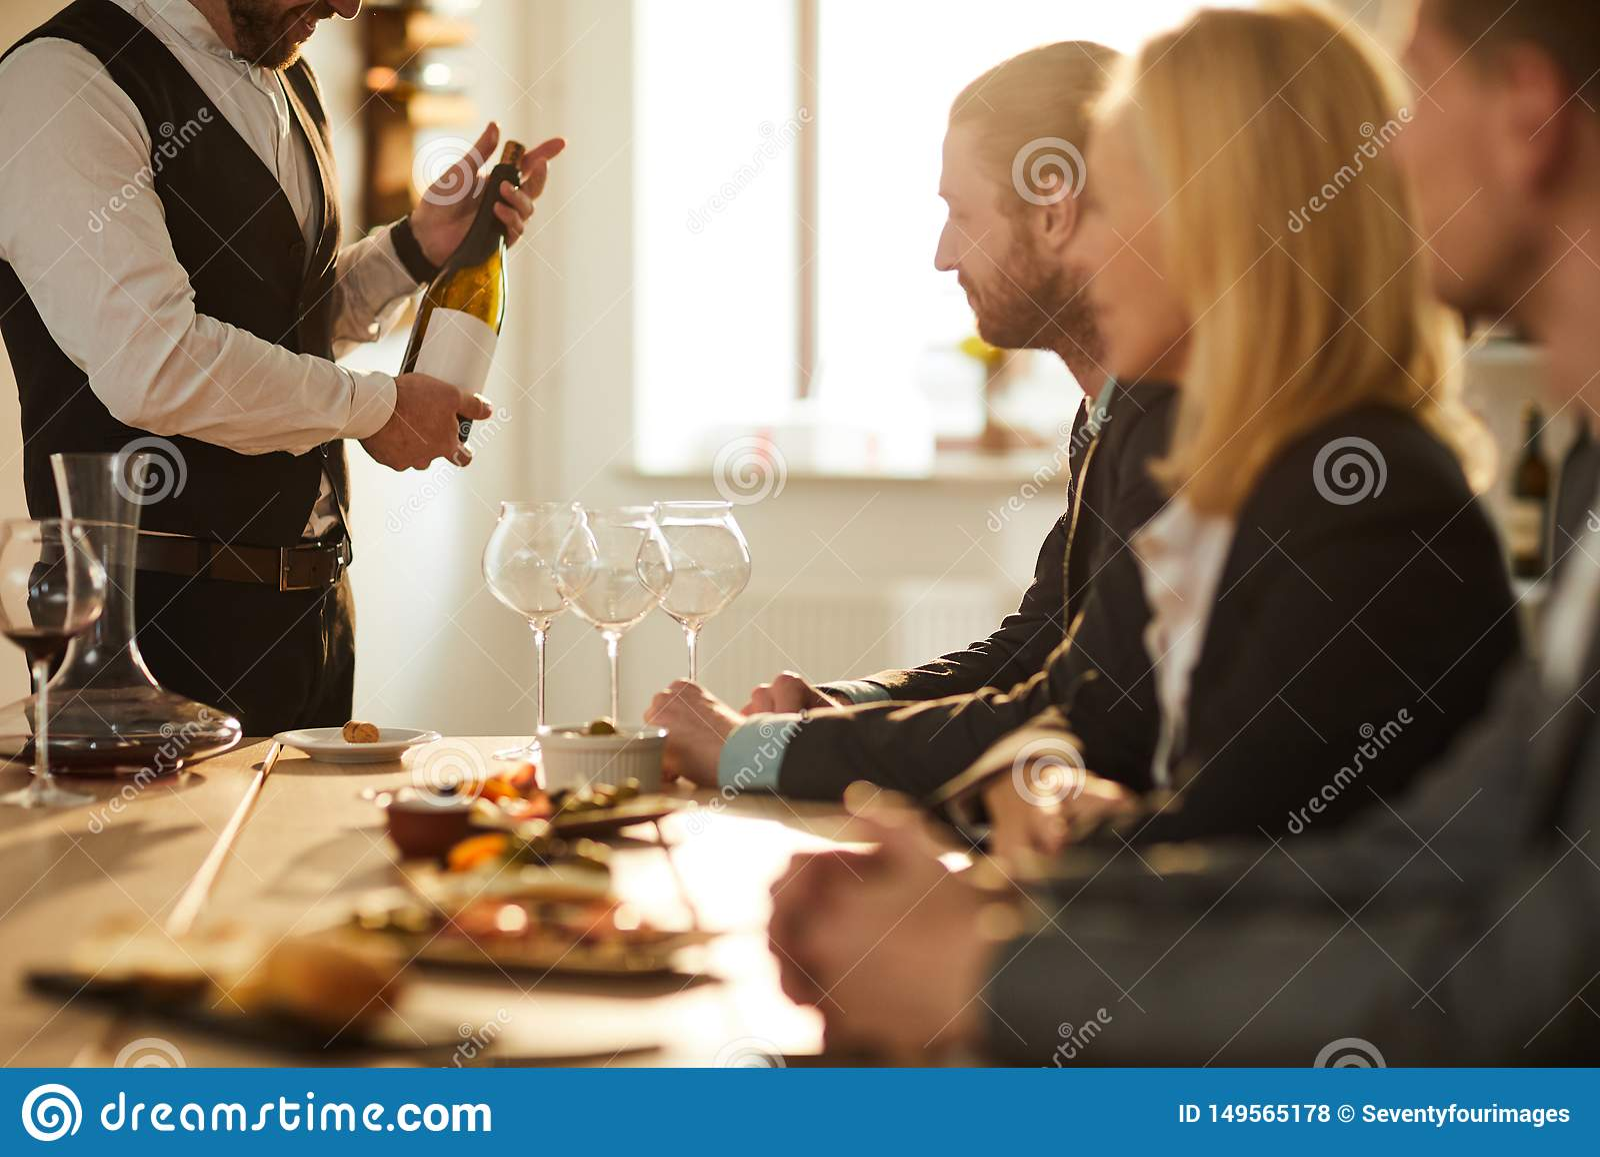 Sommelier Presenting Wine